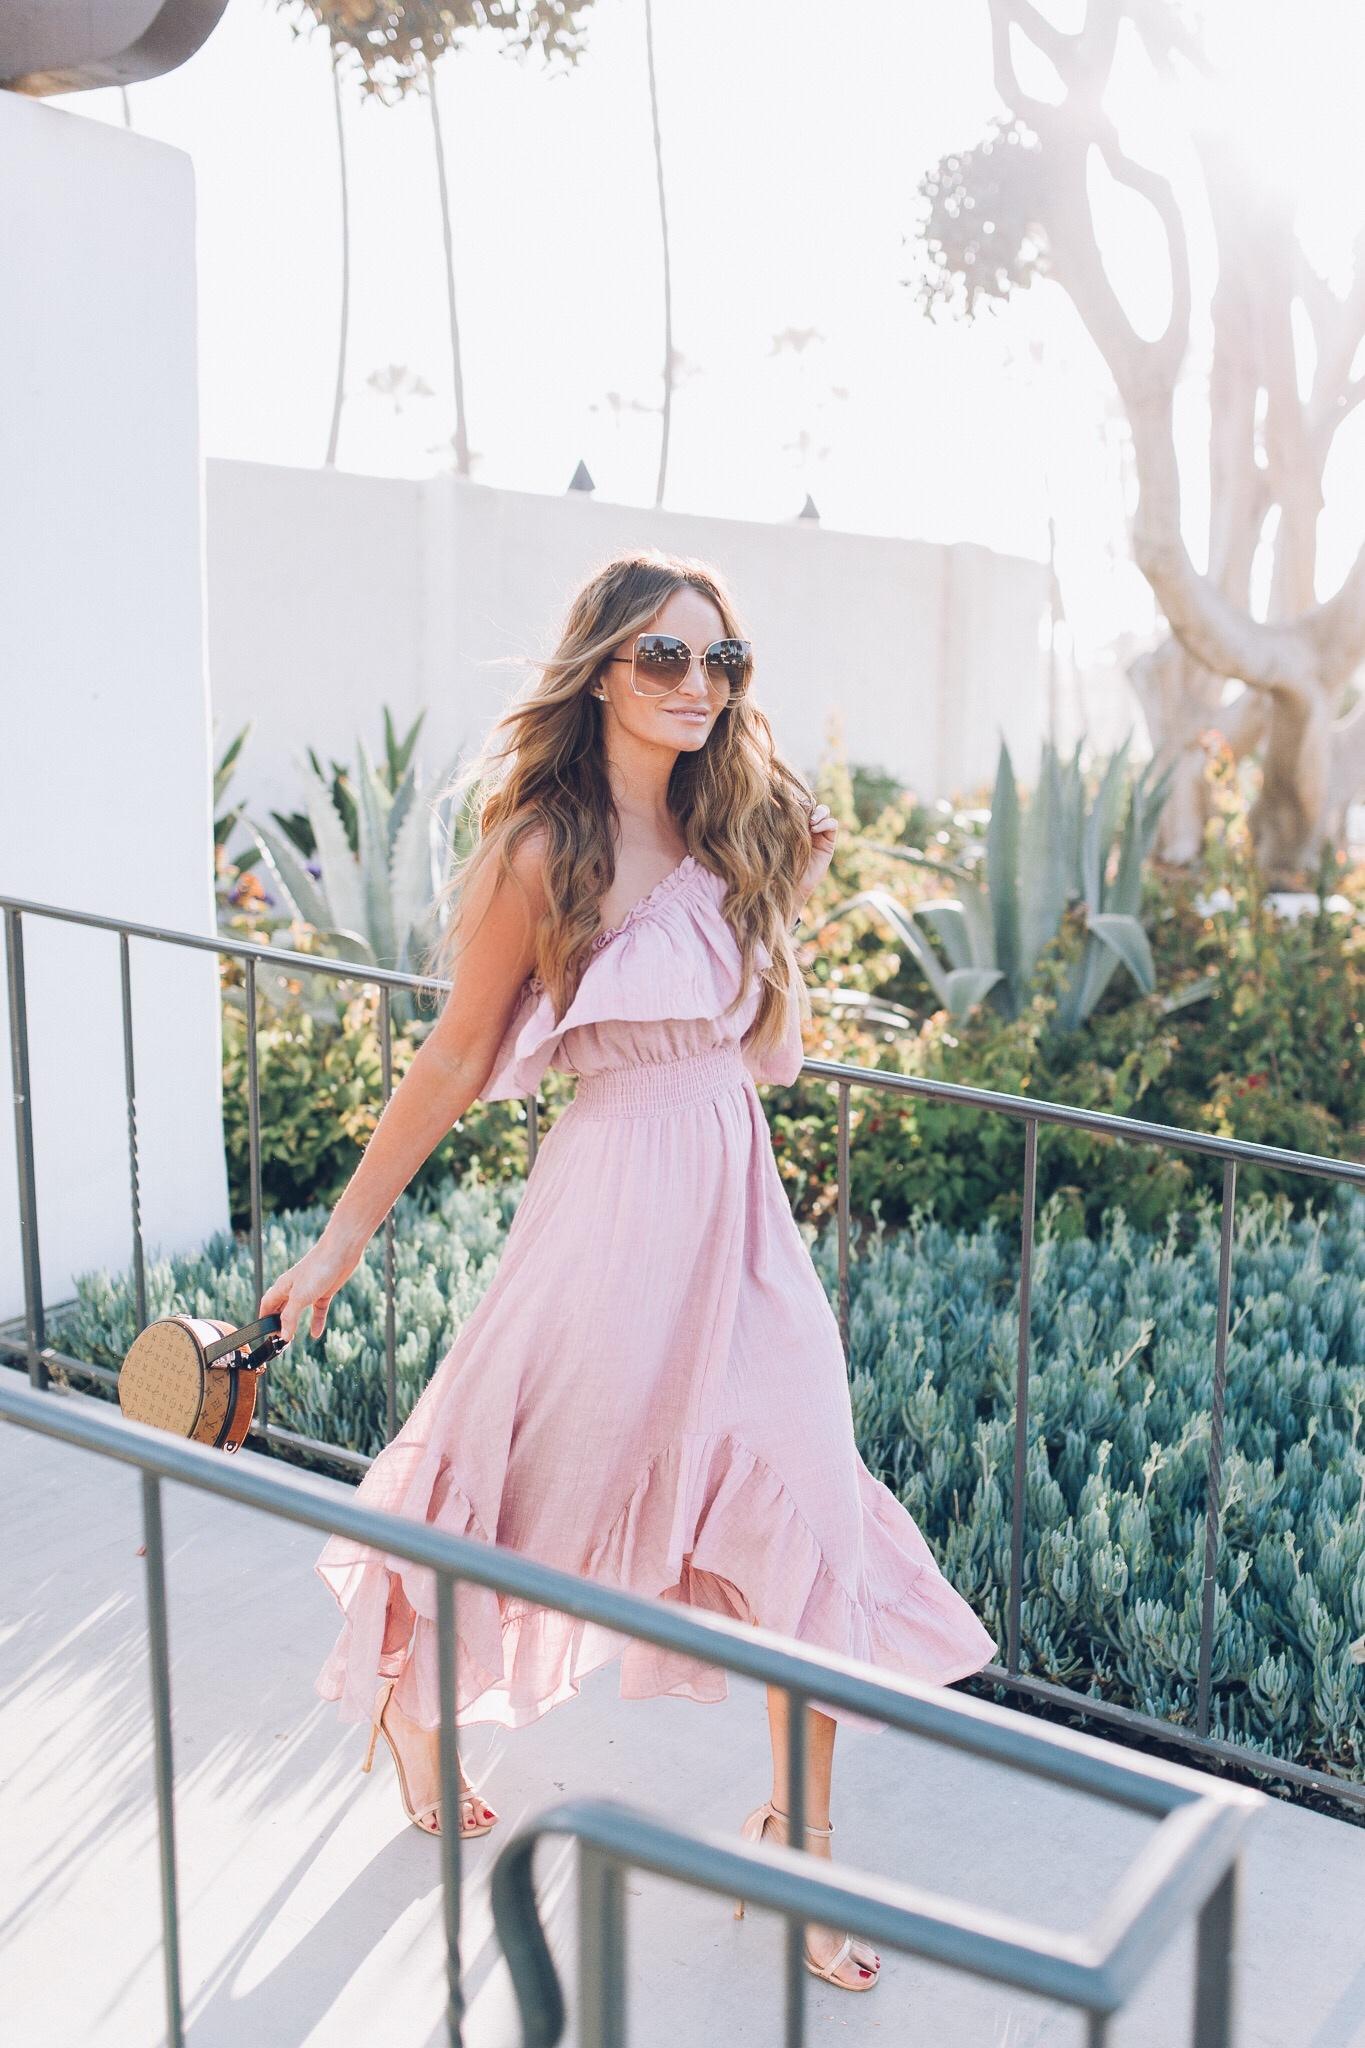 Summer Dresses 2018 - MISA Vola Dress - DKW Fashion